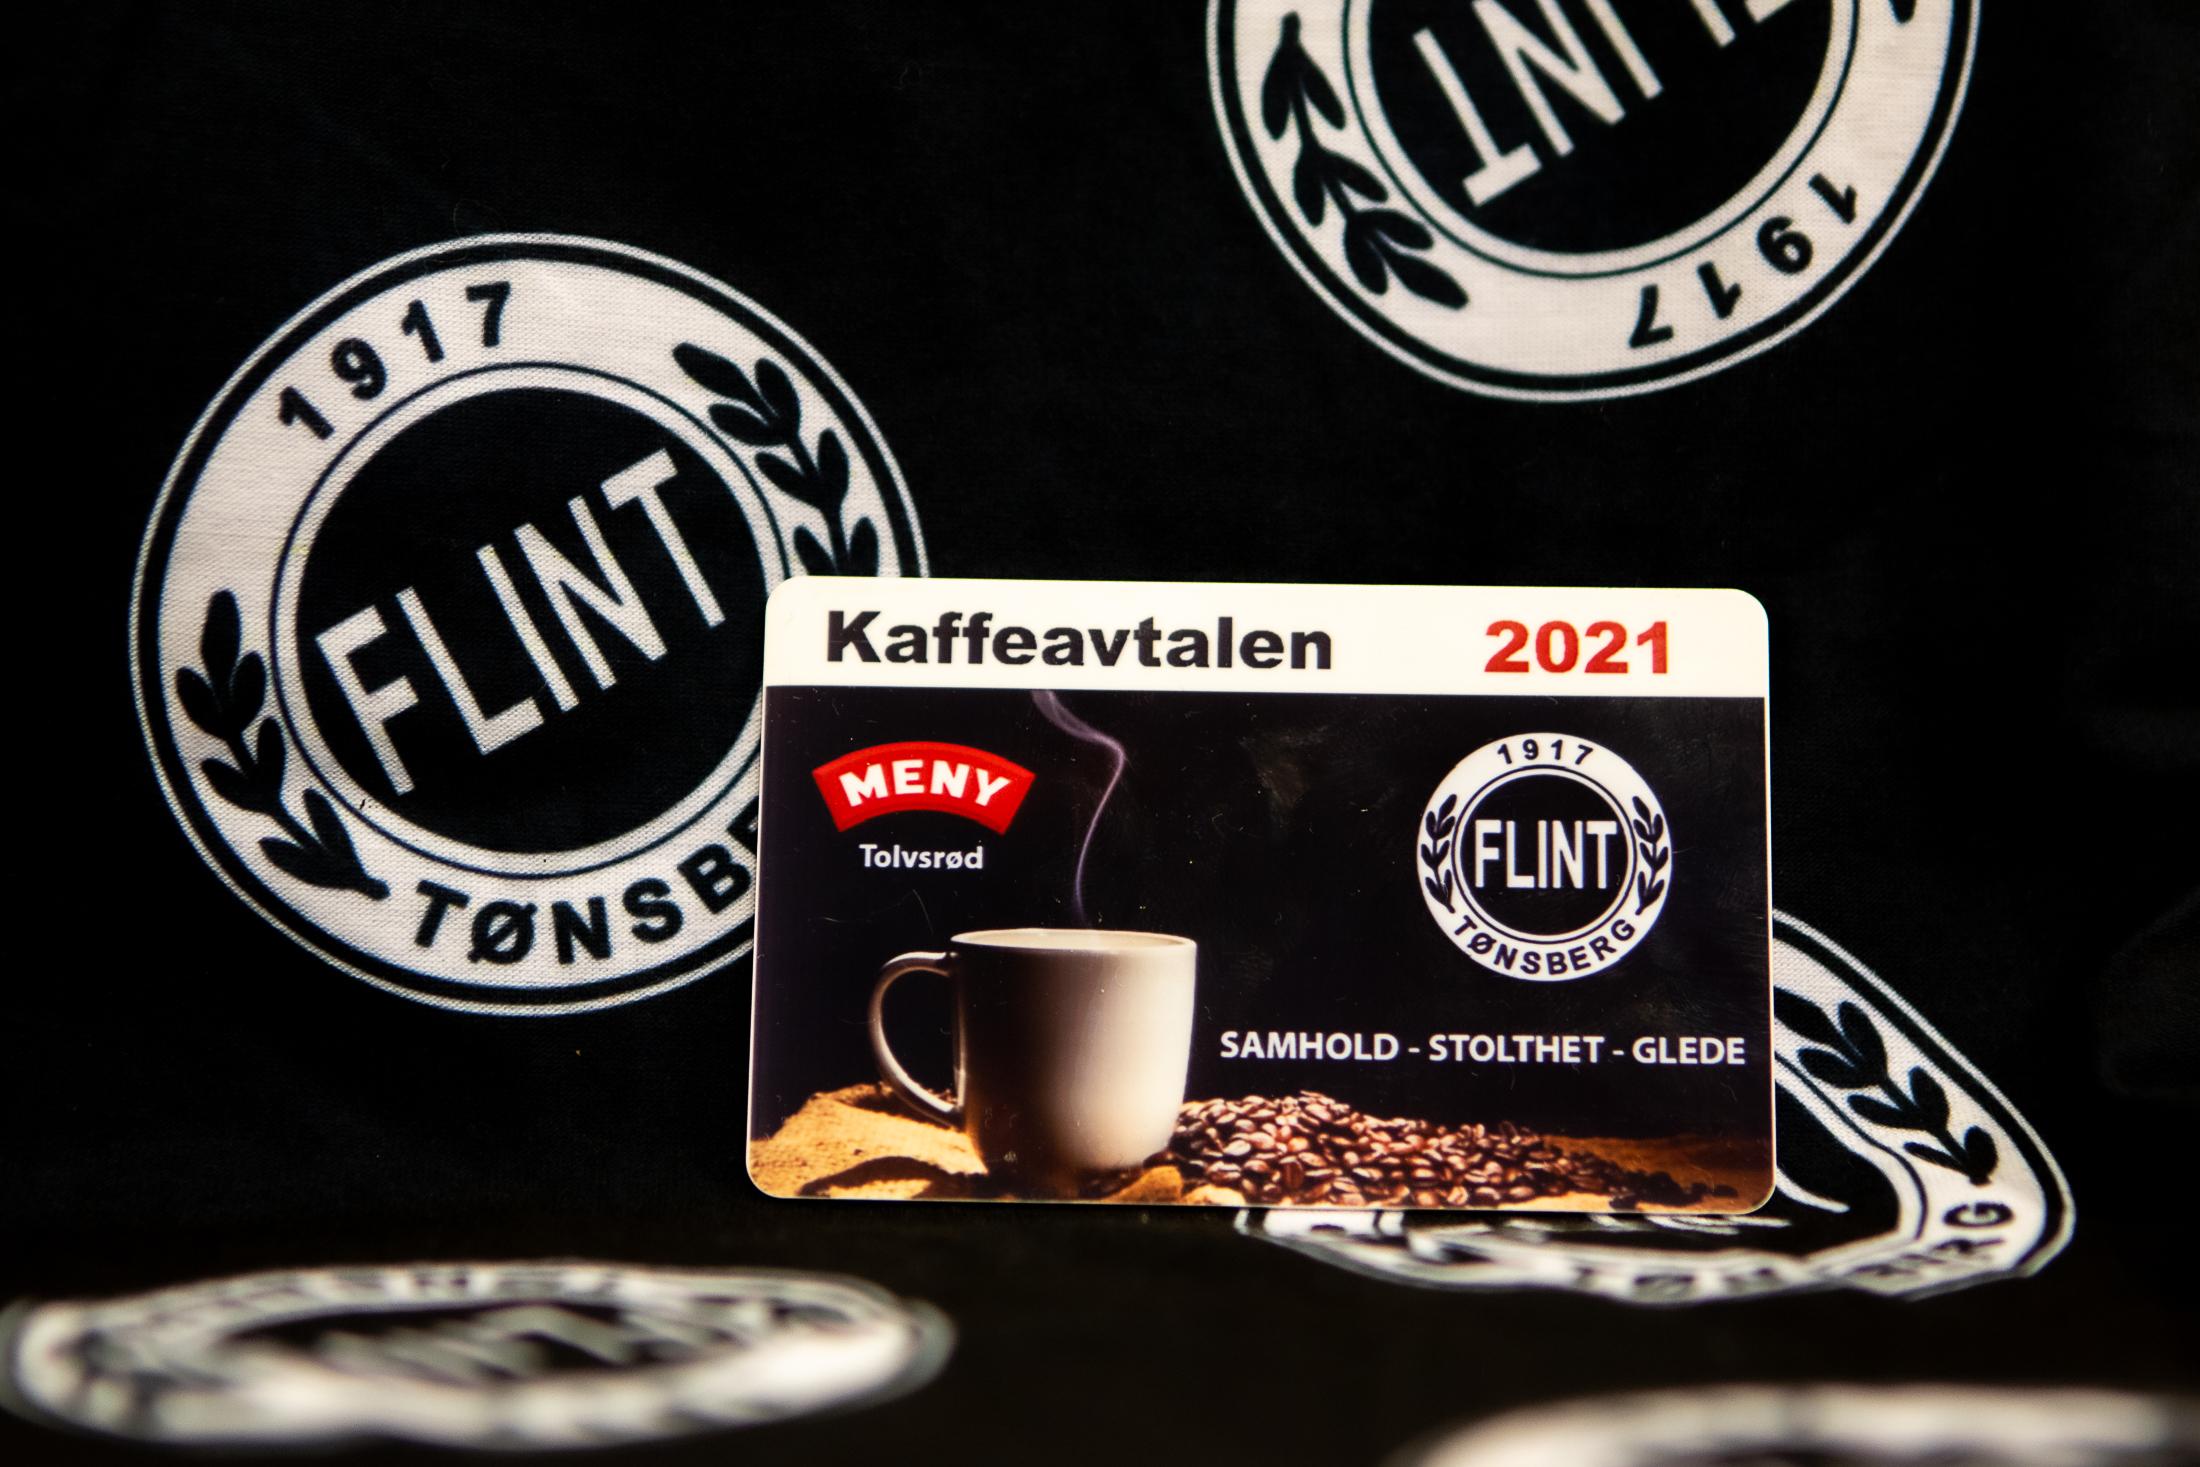 https://www.flintfotball.no/wp-content/uploads/2020/12/Kaffeavtale-sesongkort-2021-8.jpg